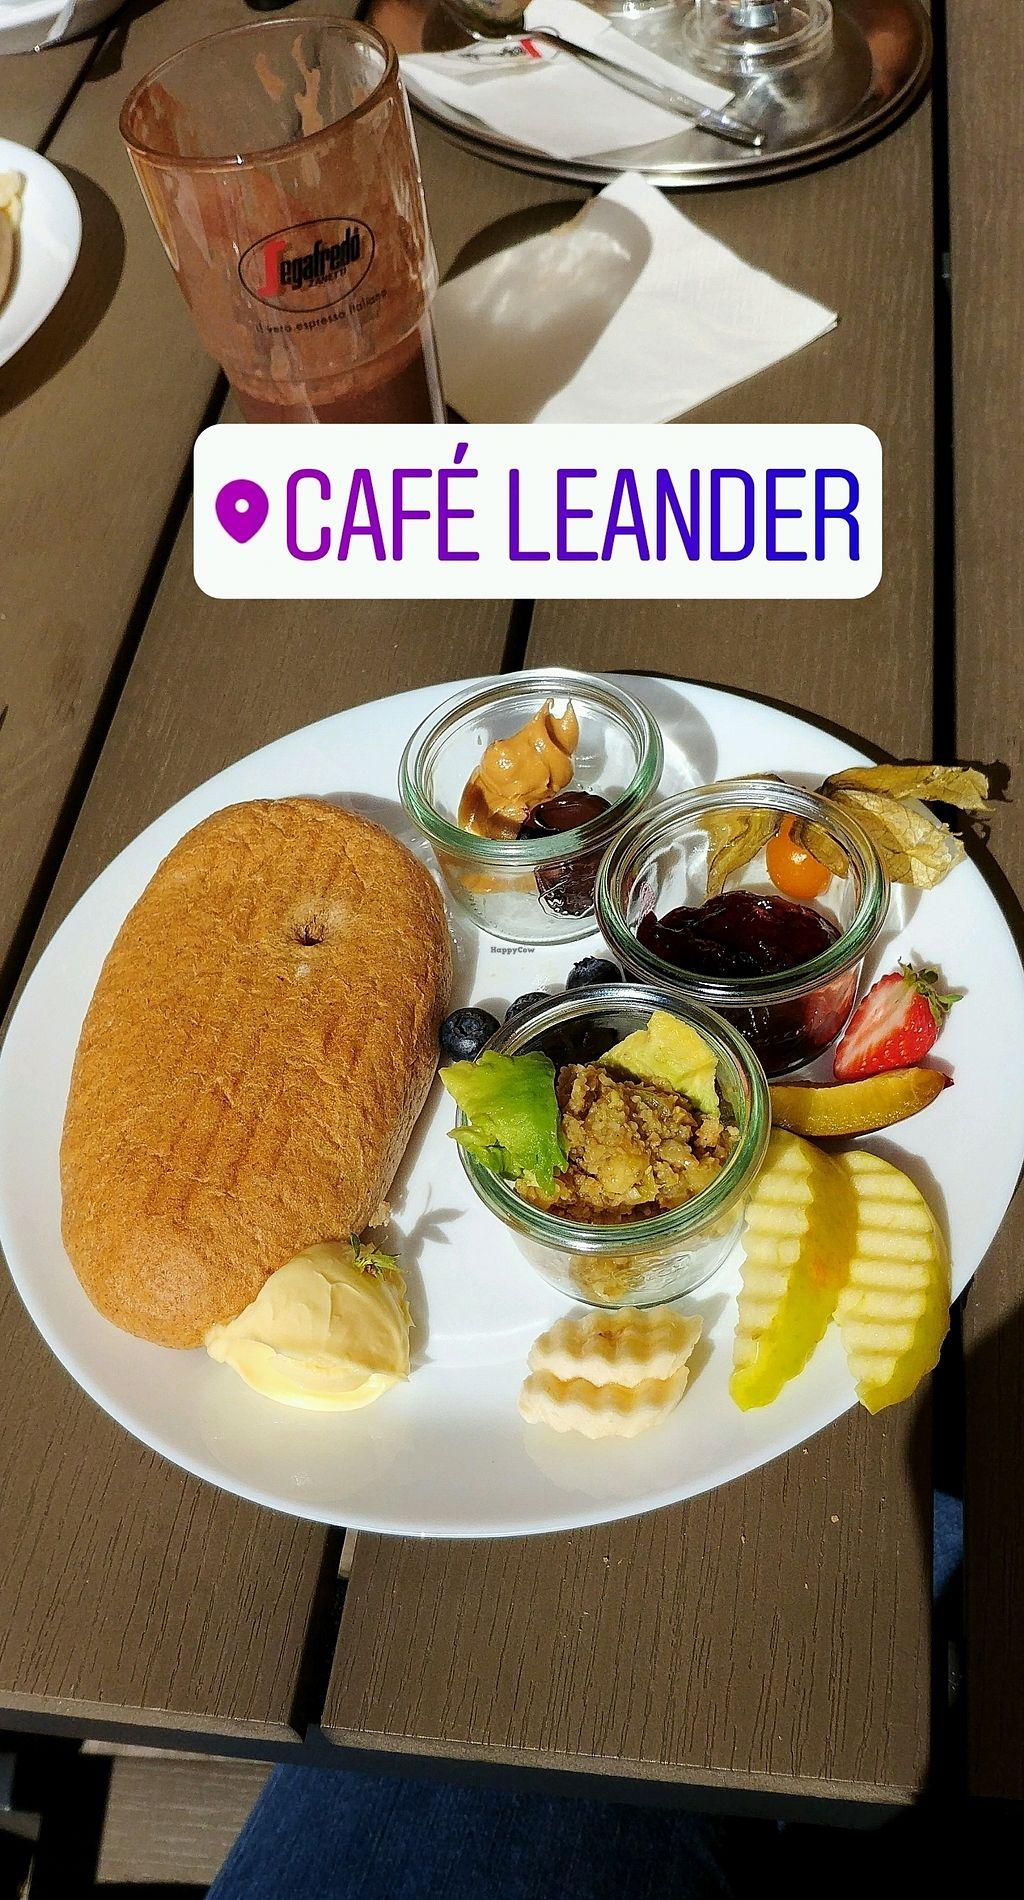 "Photo of Cafe Leander  by <a href=""/members/profile/JanaRu"">JanaRu</a> <br/>vegan breakfast <br/> August 25, 2017  - <a href='/contact/abuse/image/63221/297044'>Report</a>"